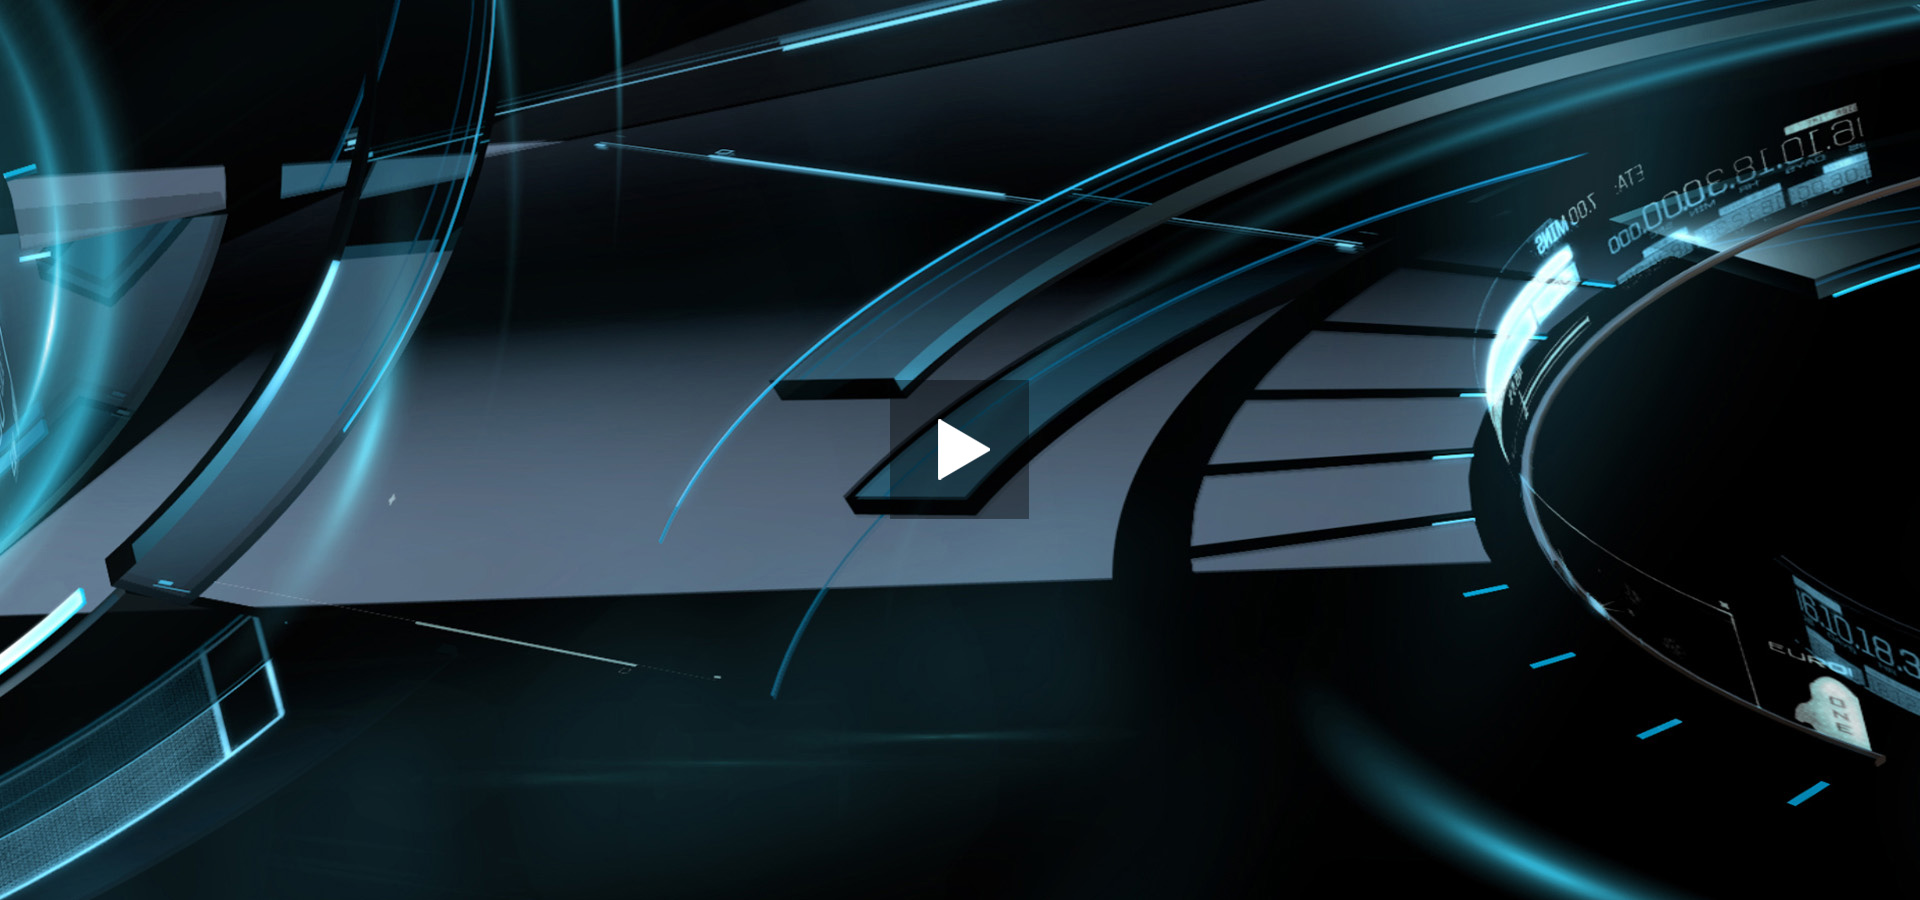 Monkey Talkie per Premium Steel - Broadcast design - TV Branding - Promo - Idents